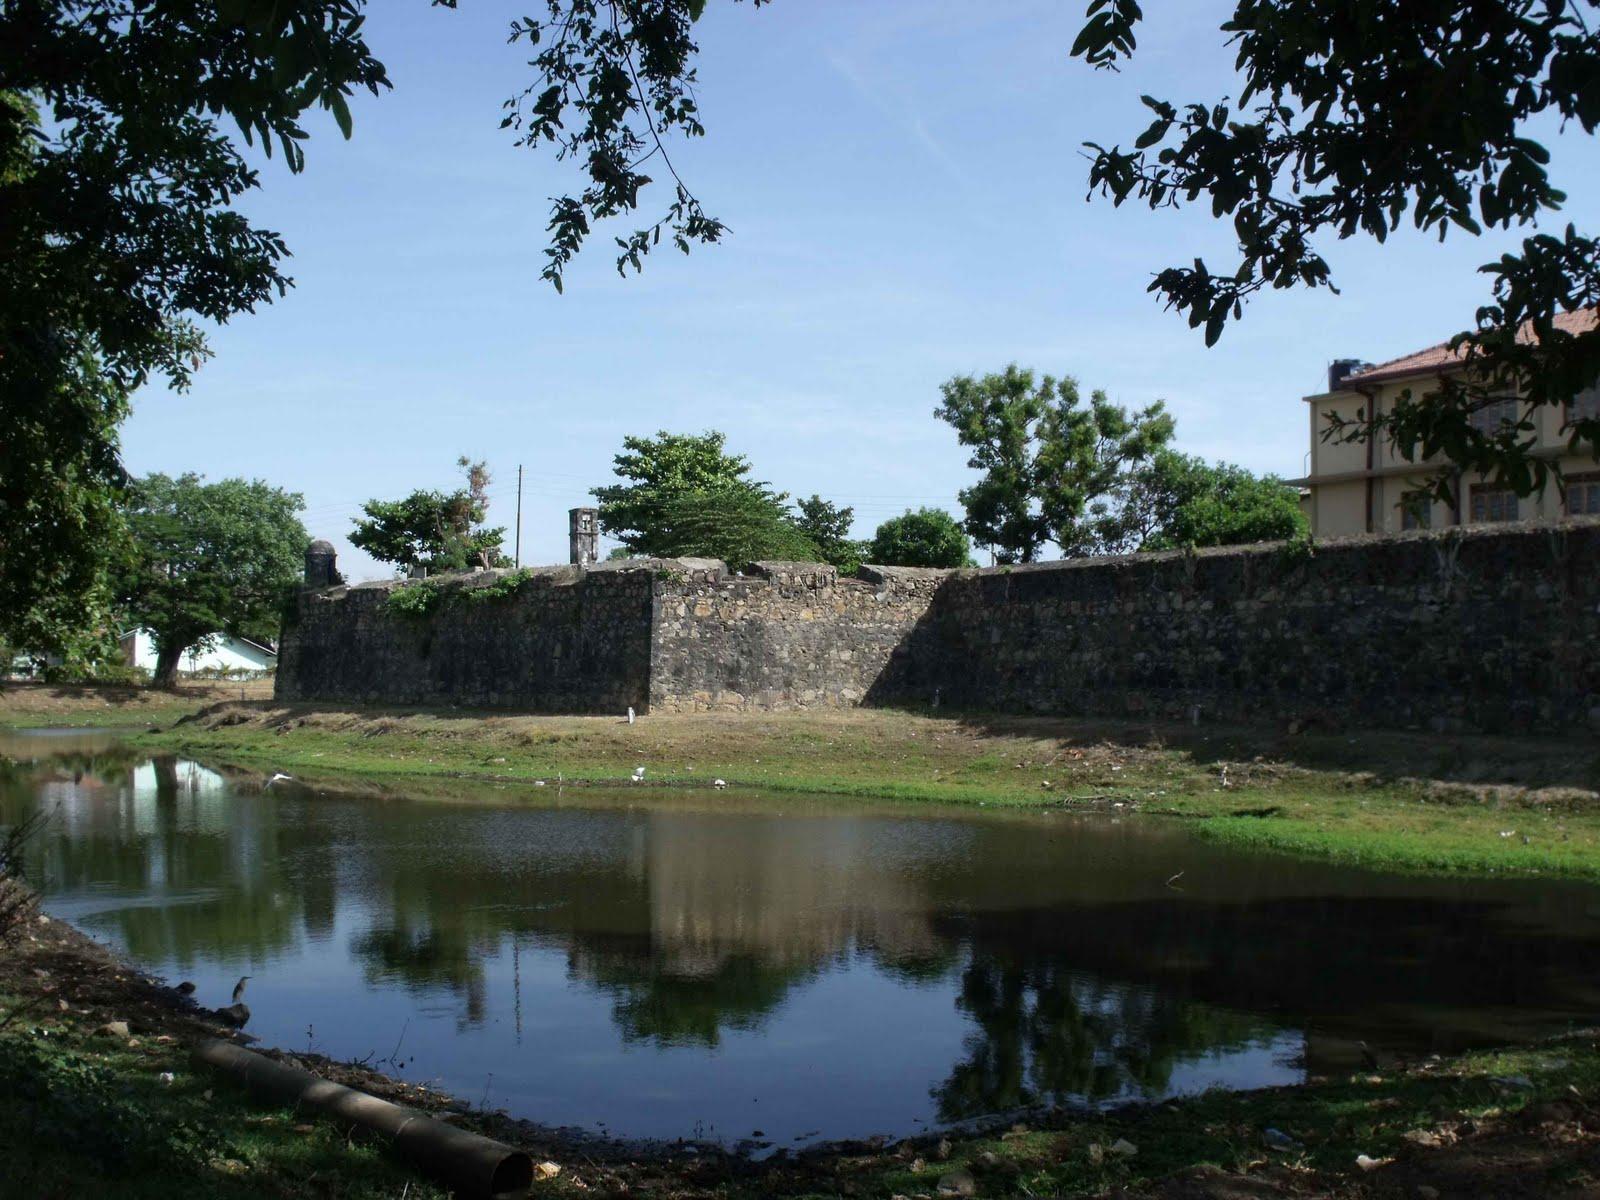 Batticaloa Sri Lanka  city photos gallery : ... of Sri Lanka on blogspot.com: Old Dutch Fort, Batticaloa, Sri Lanka